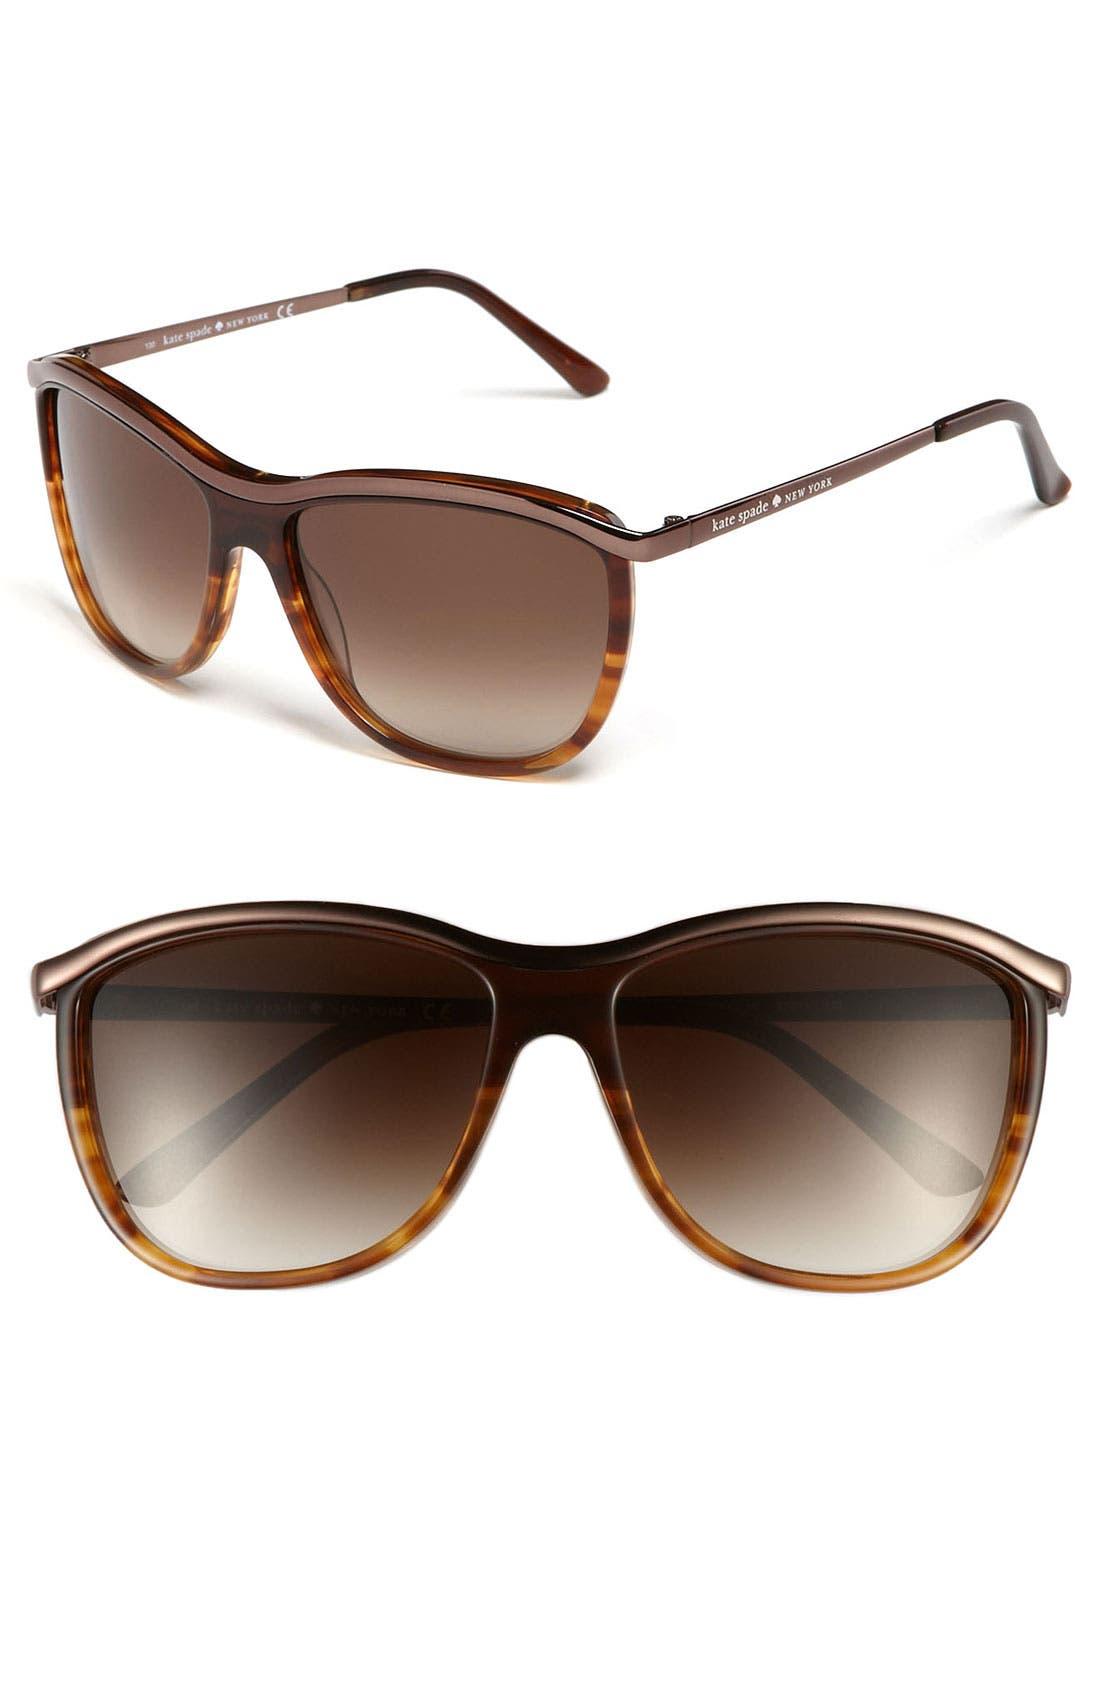 Main Image - kate spade new york 'domina' 57mm retro sunglasses